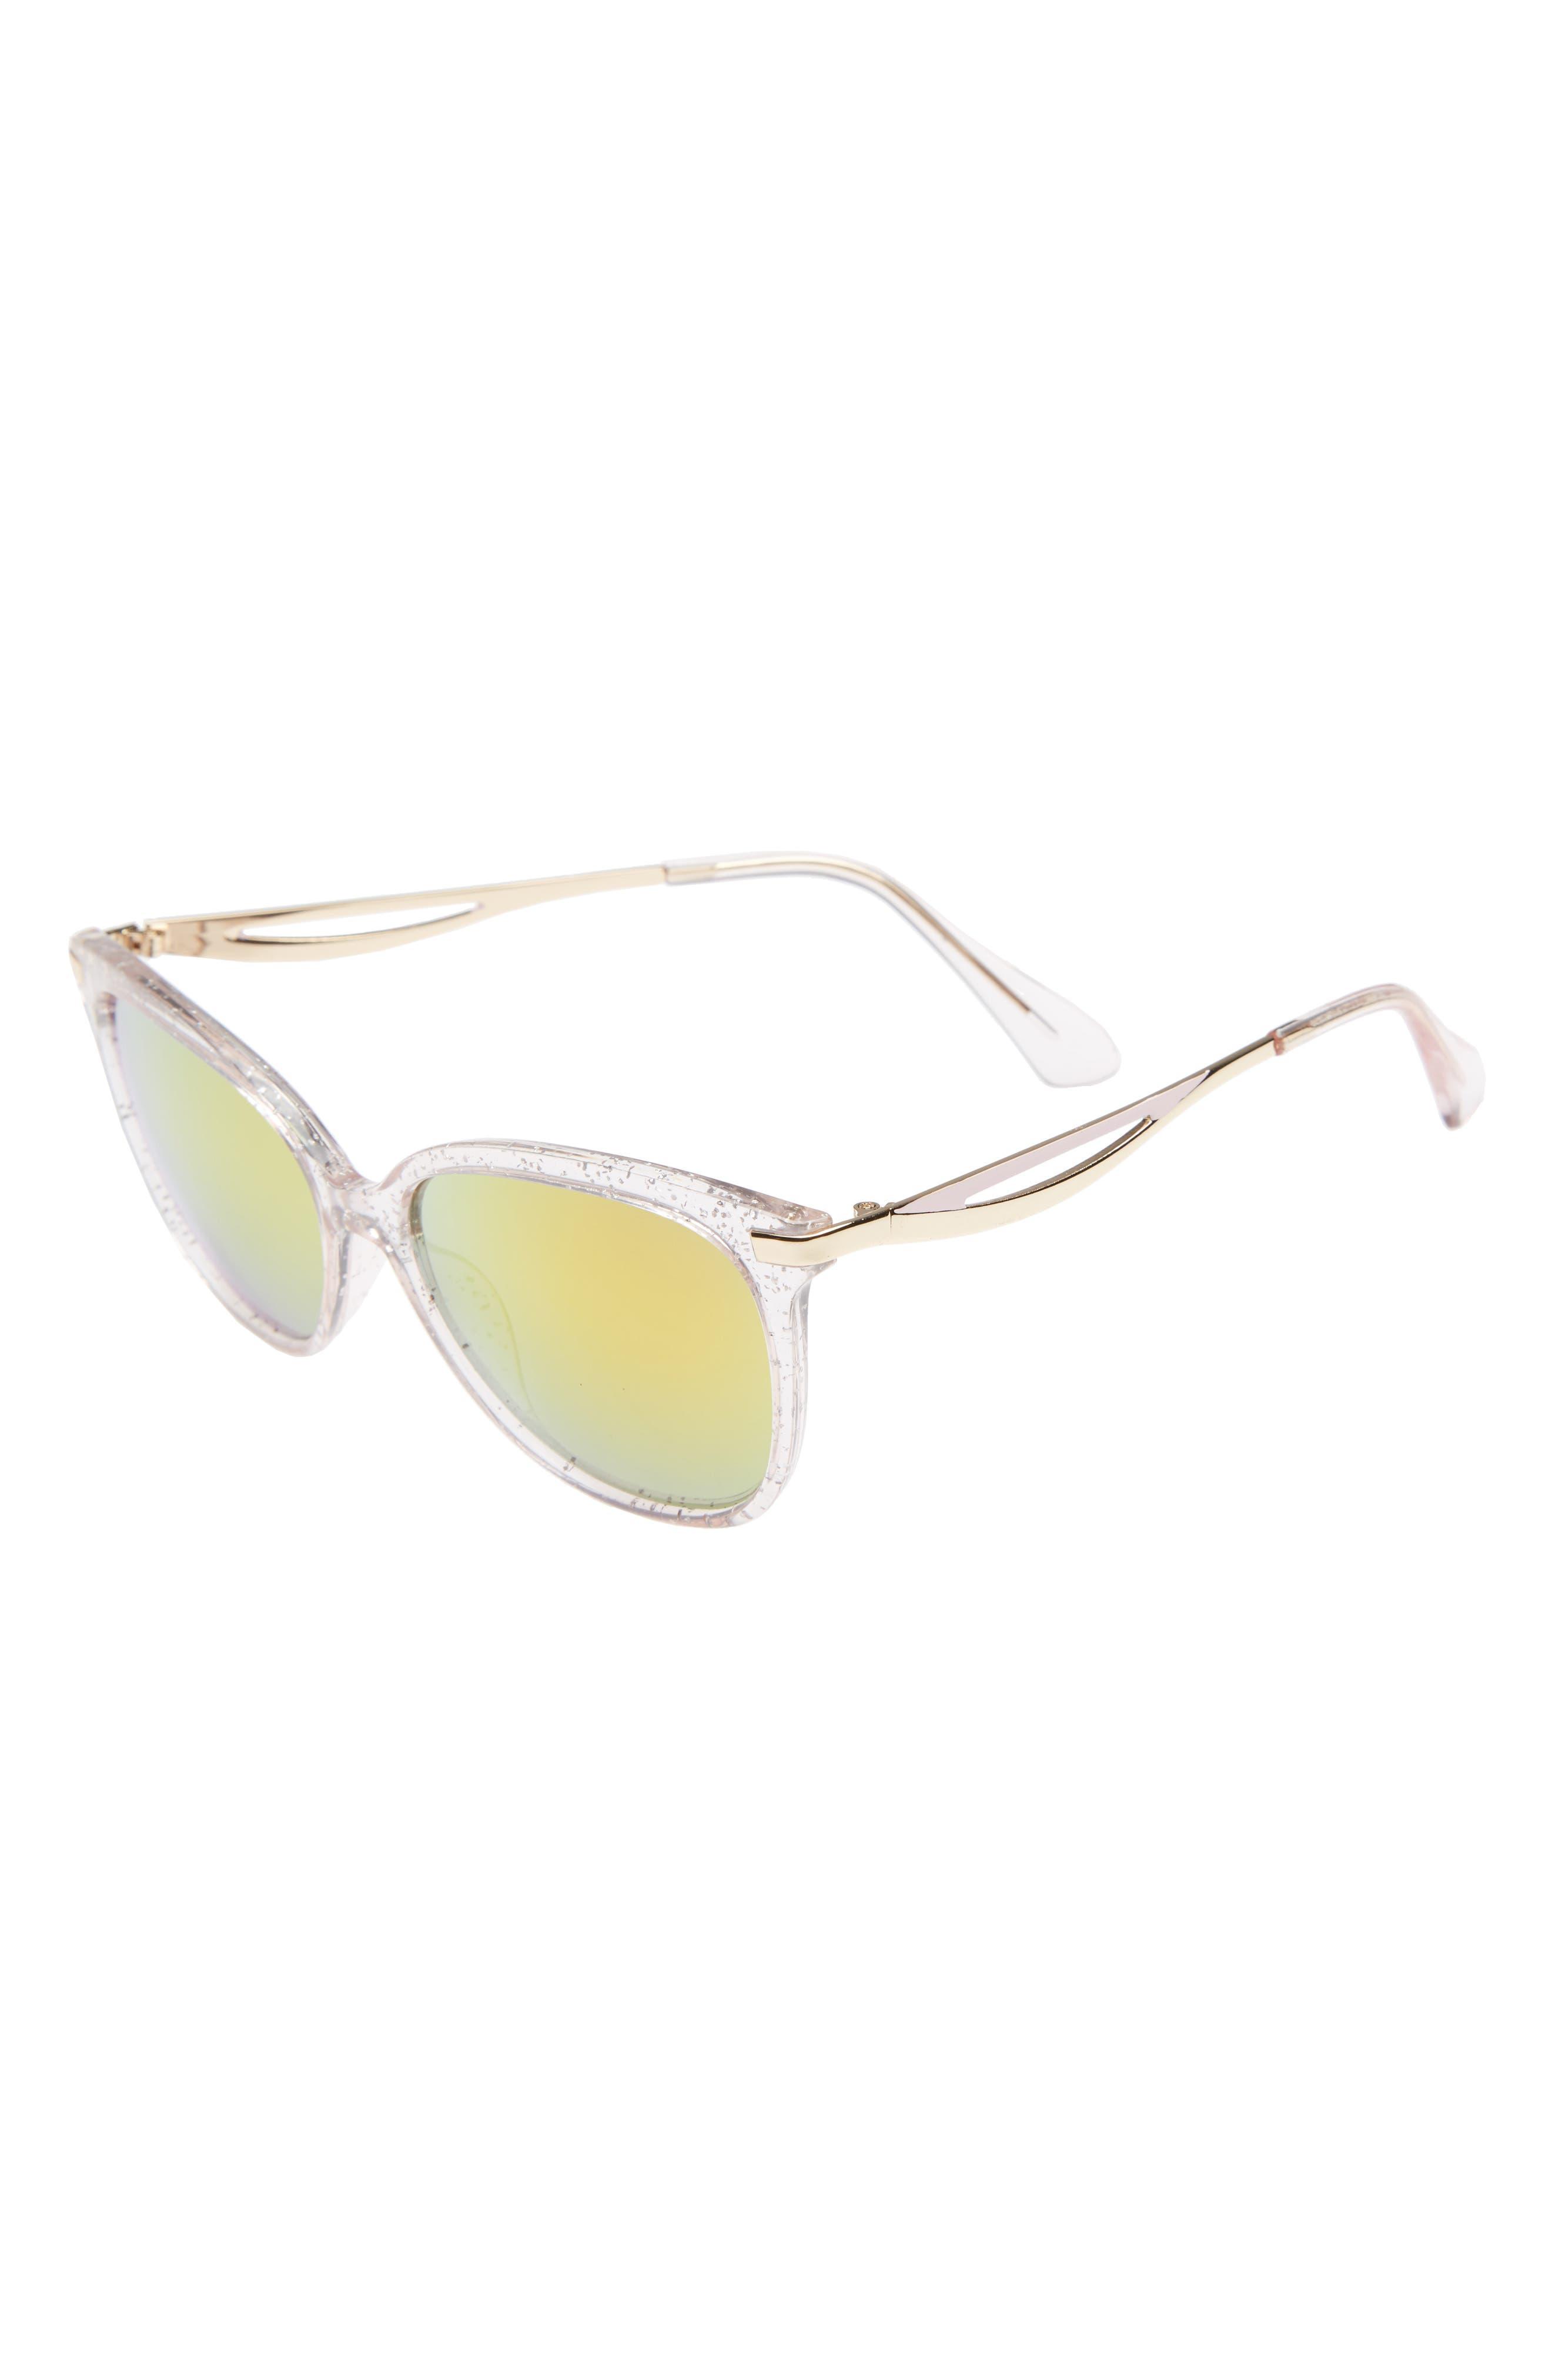 FANTASEYES Fantas Eyes Sadie 45mm Glitter Sunglasses, Main, color, 650